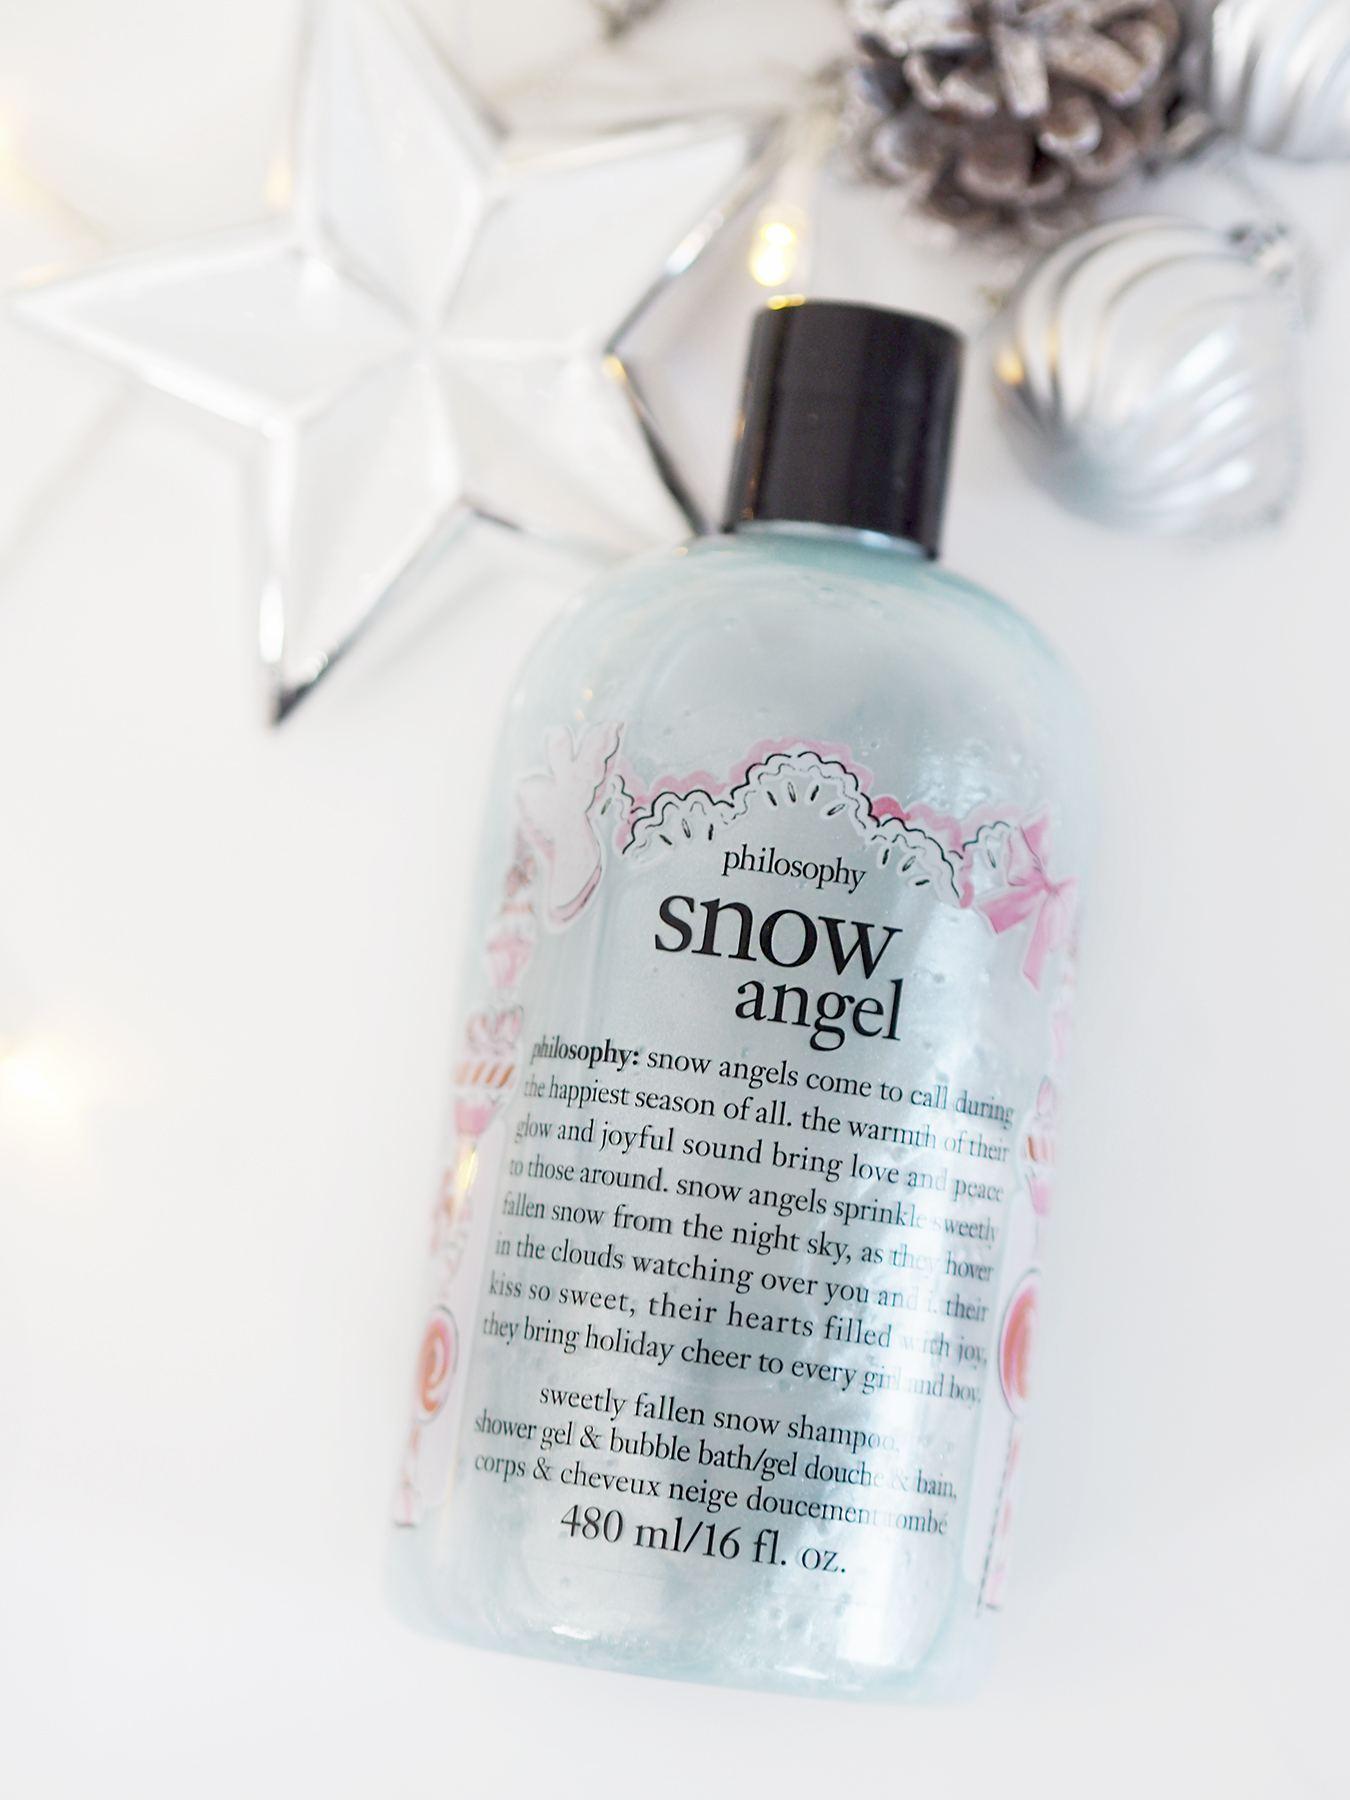 Philosophy Snow Angel shower gel